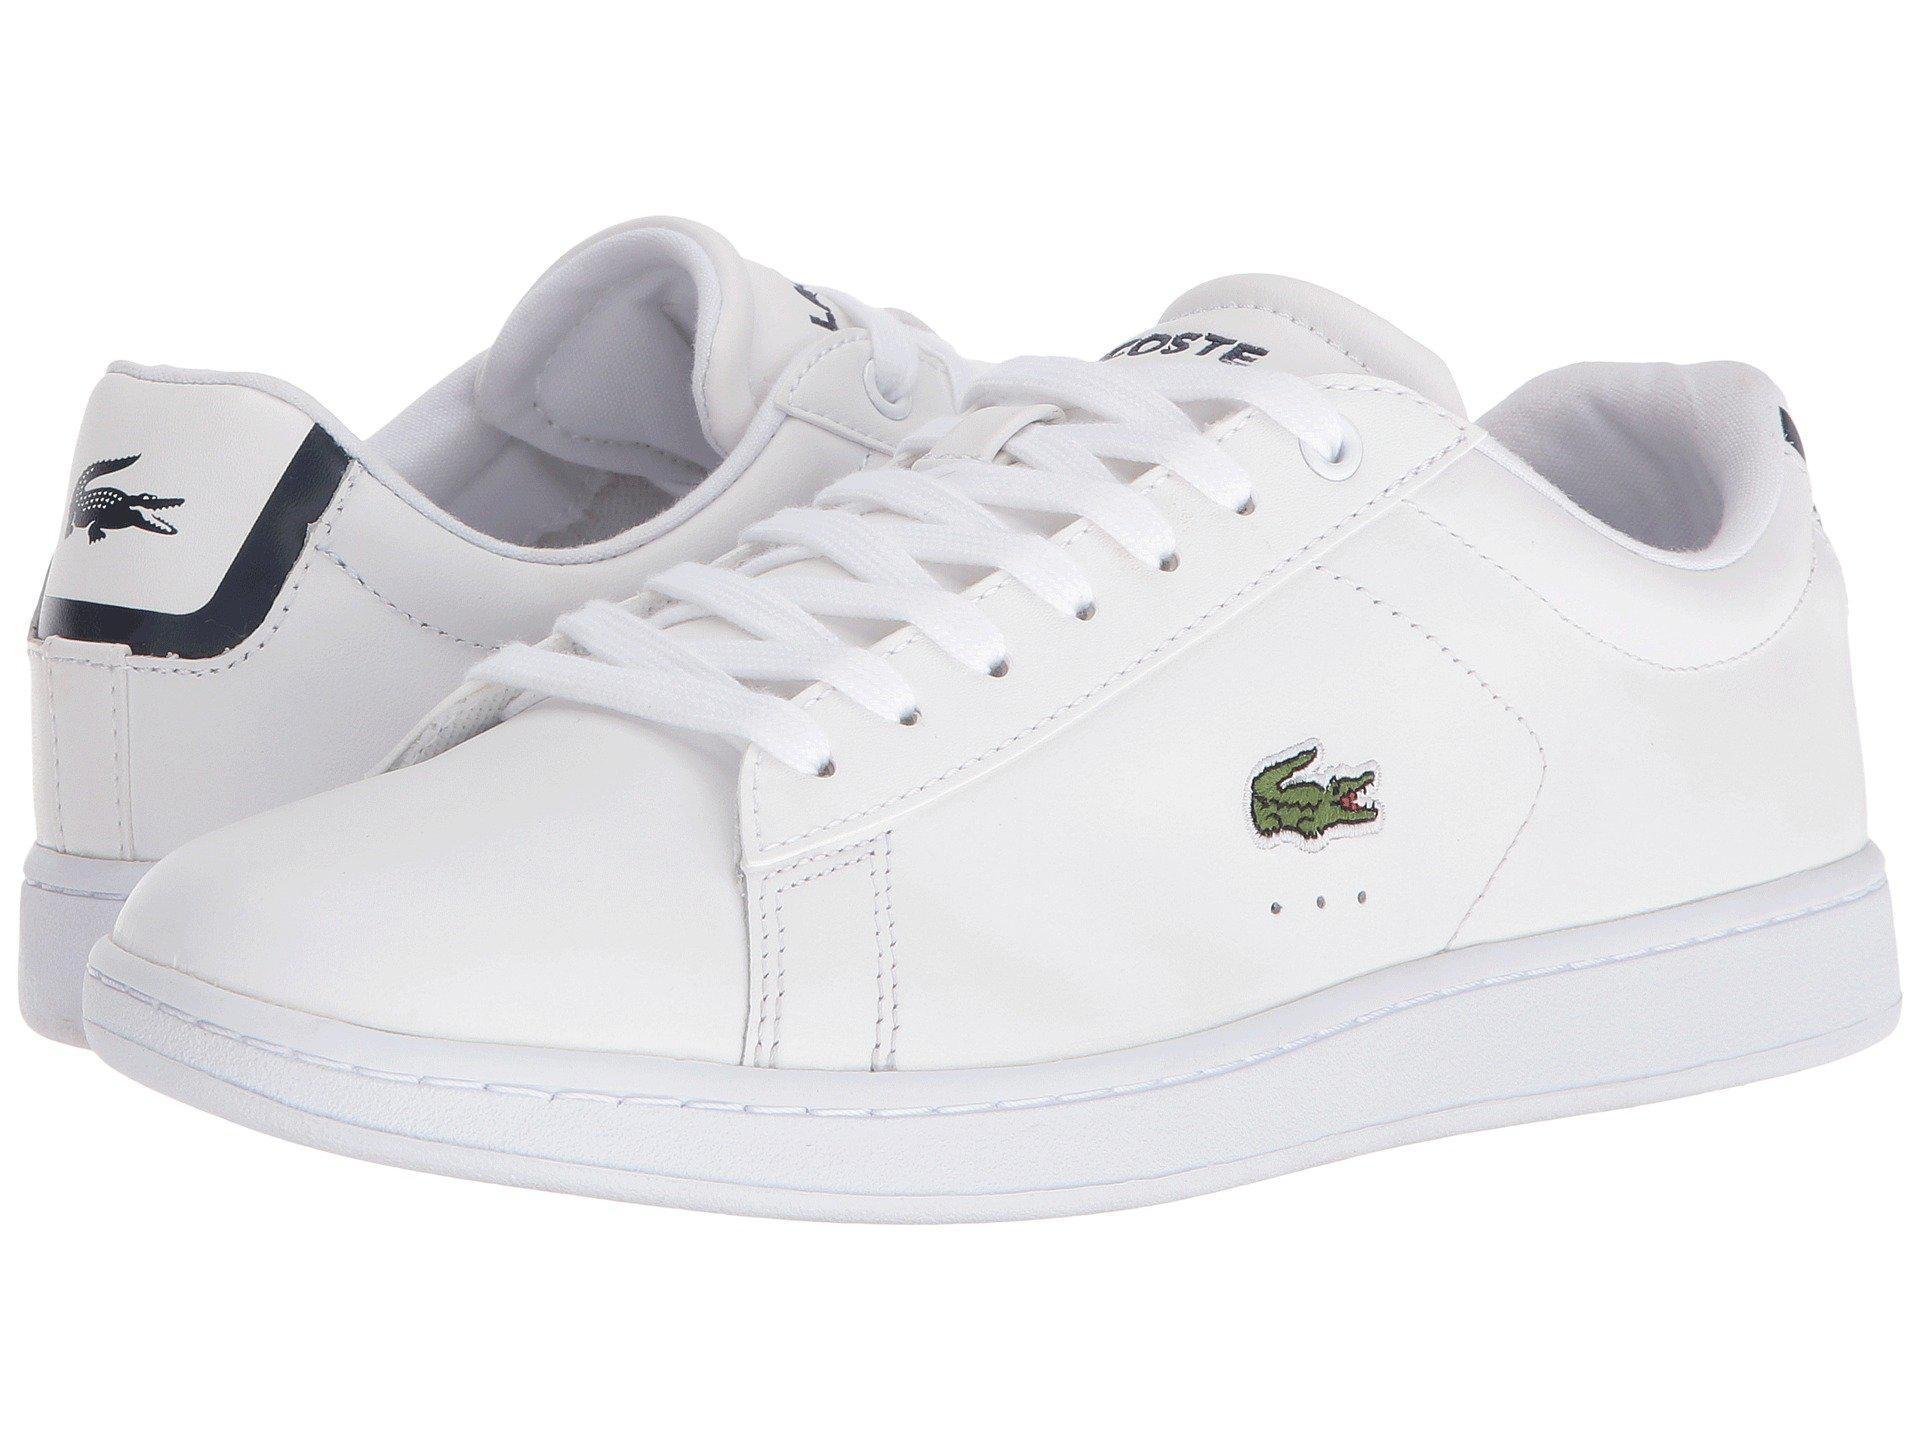 02fdf186eca607 Lyst - Lacoste Carnaby Evo Bl 1 (navy) Women s Shoes in White